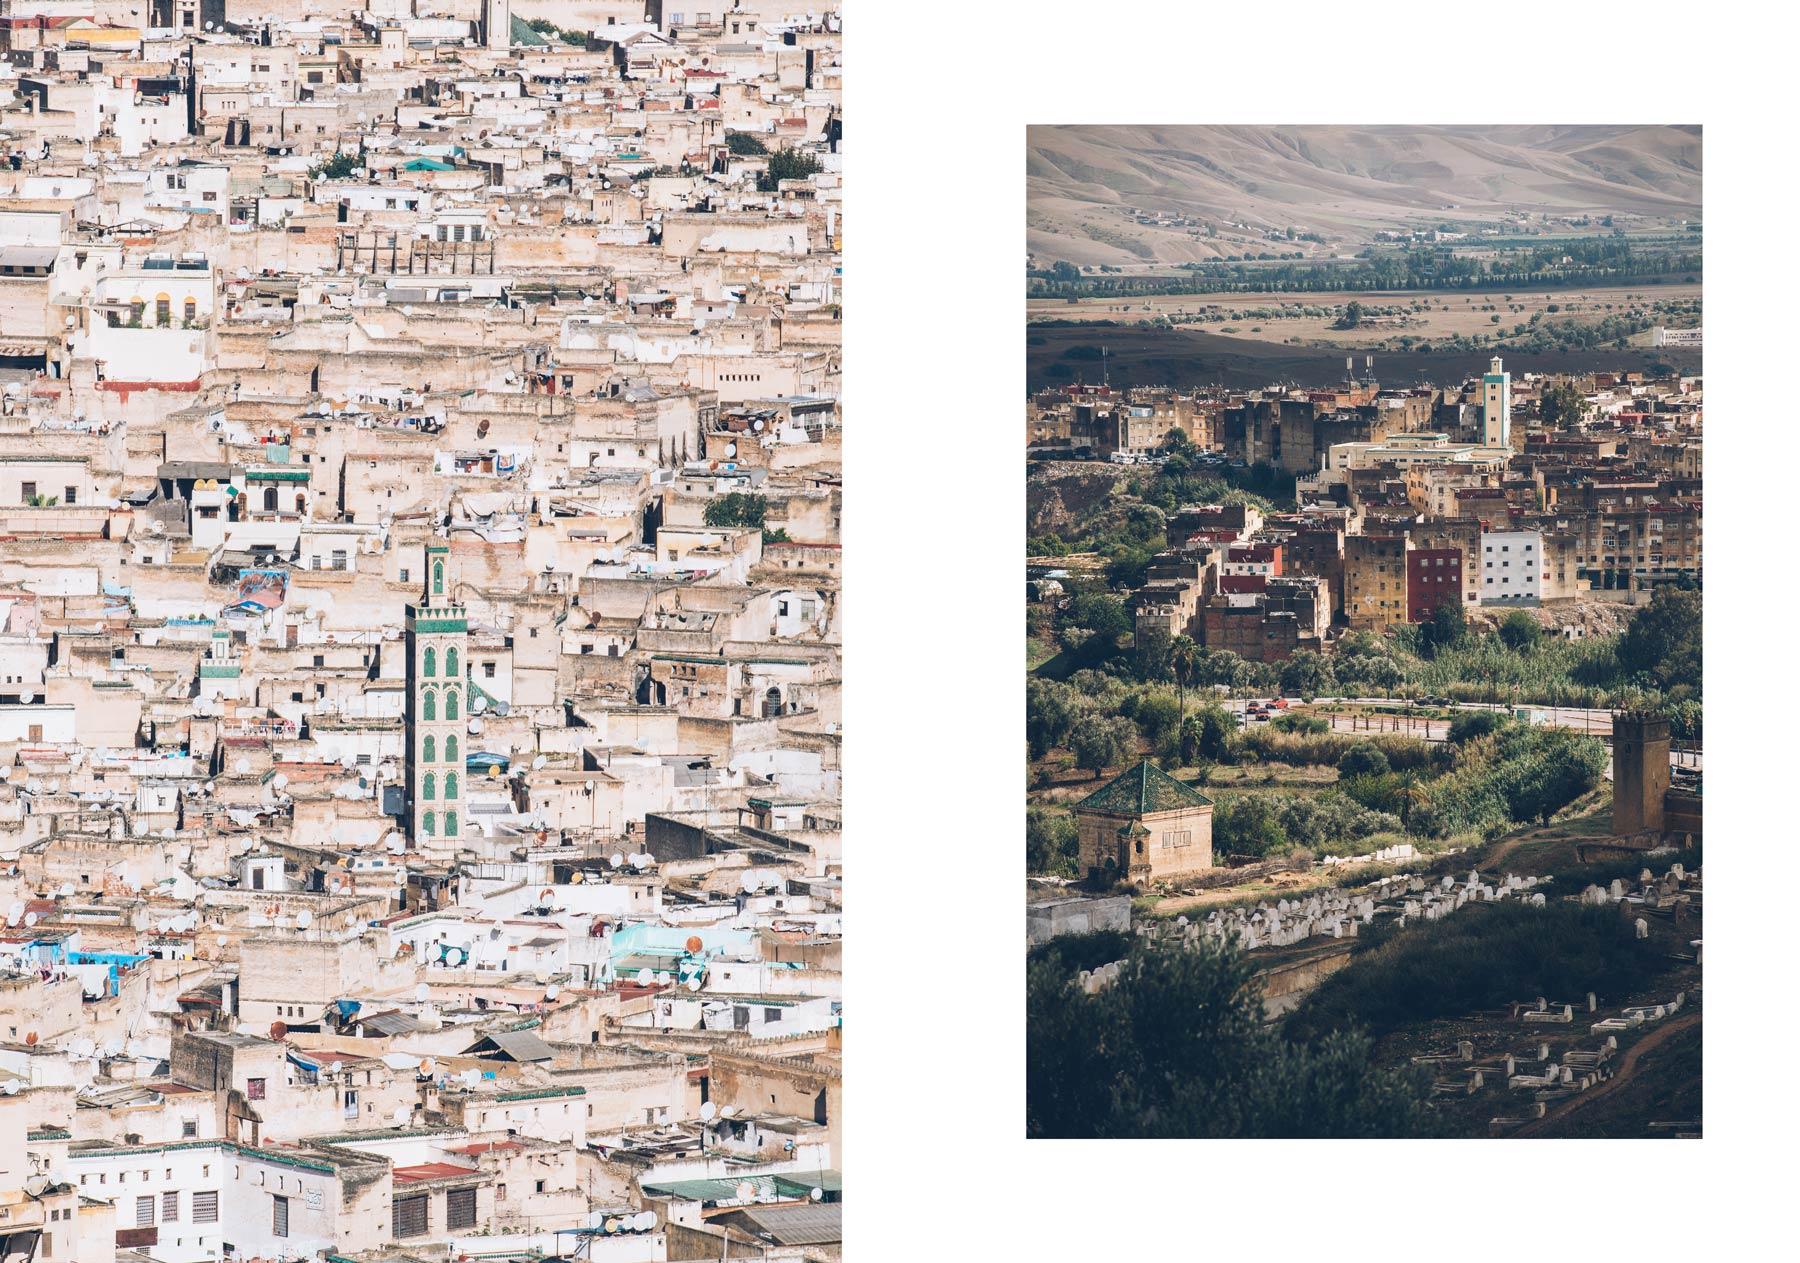 Borj Sud et Nord, Fès, Maroc